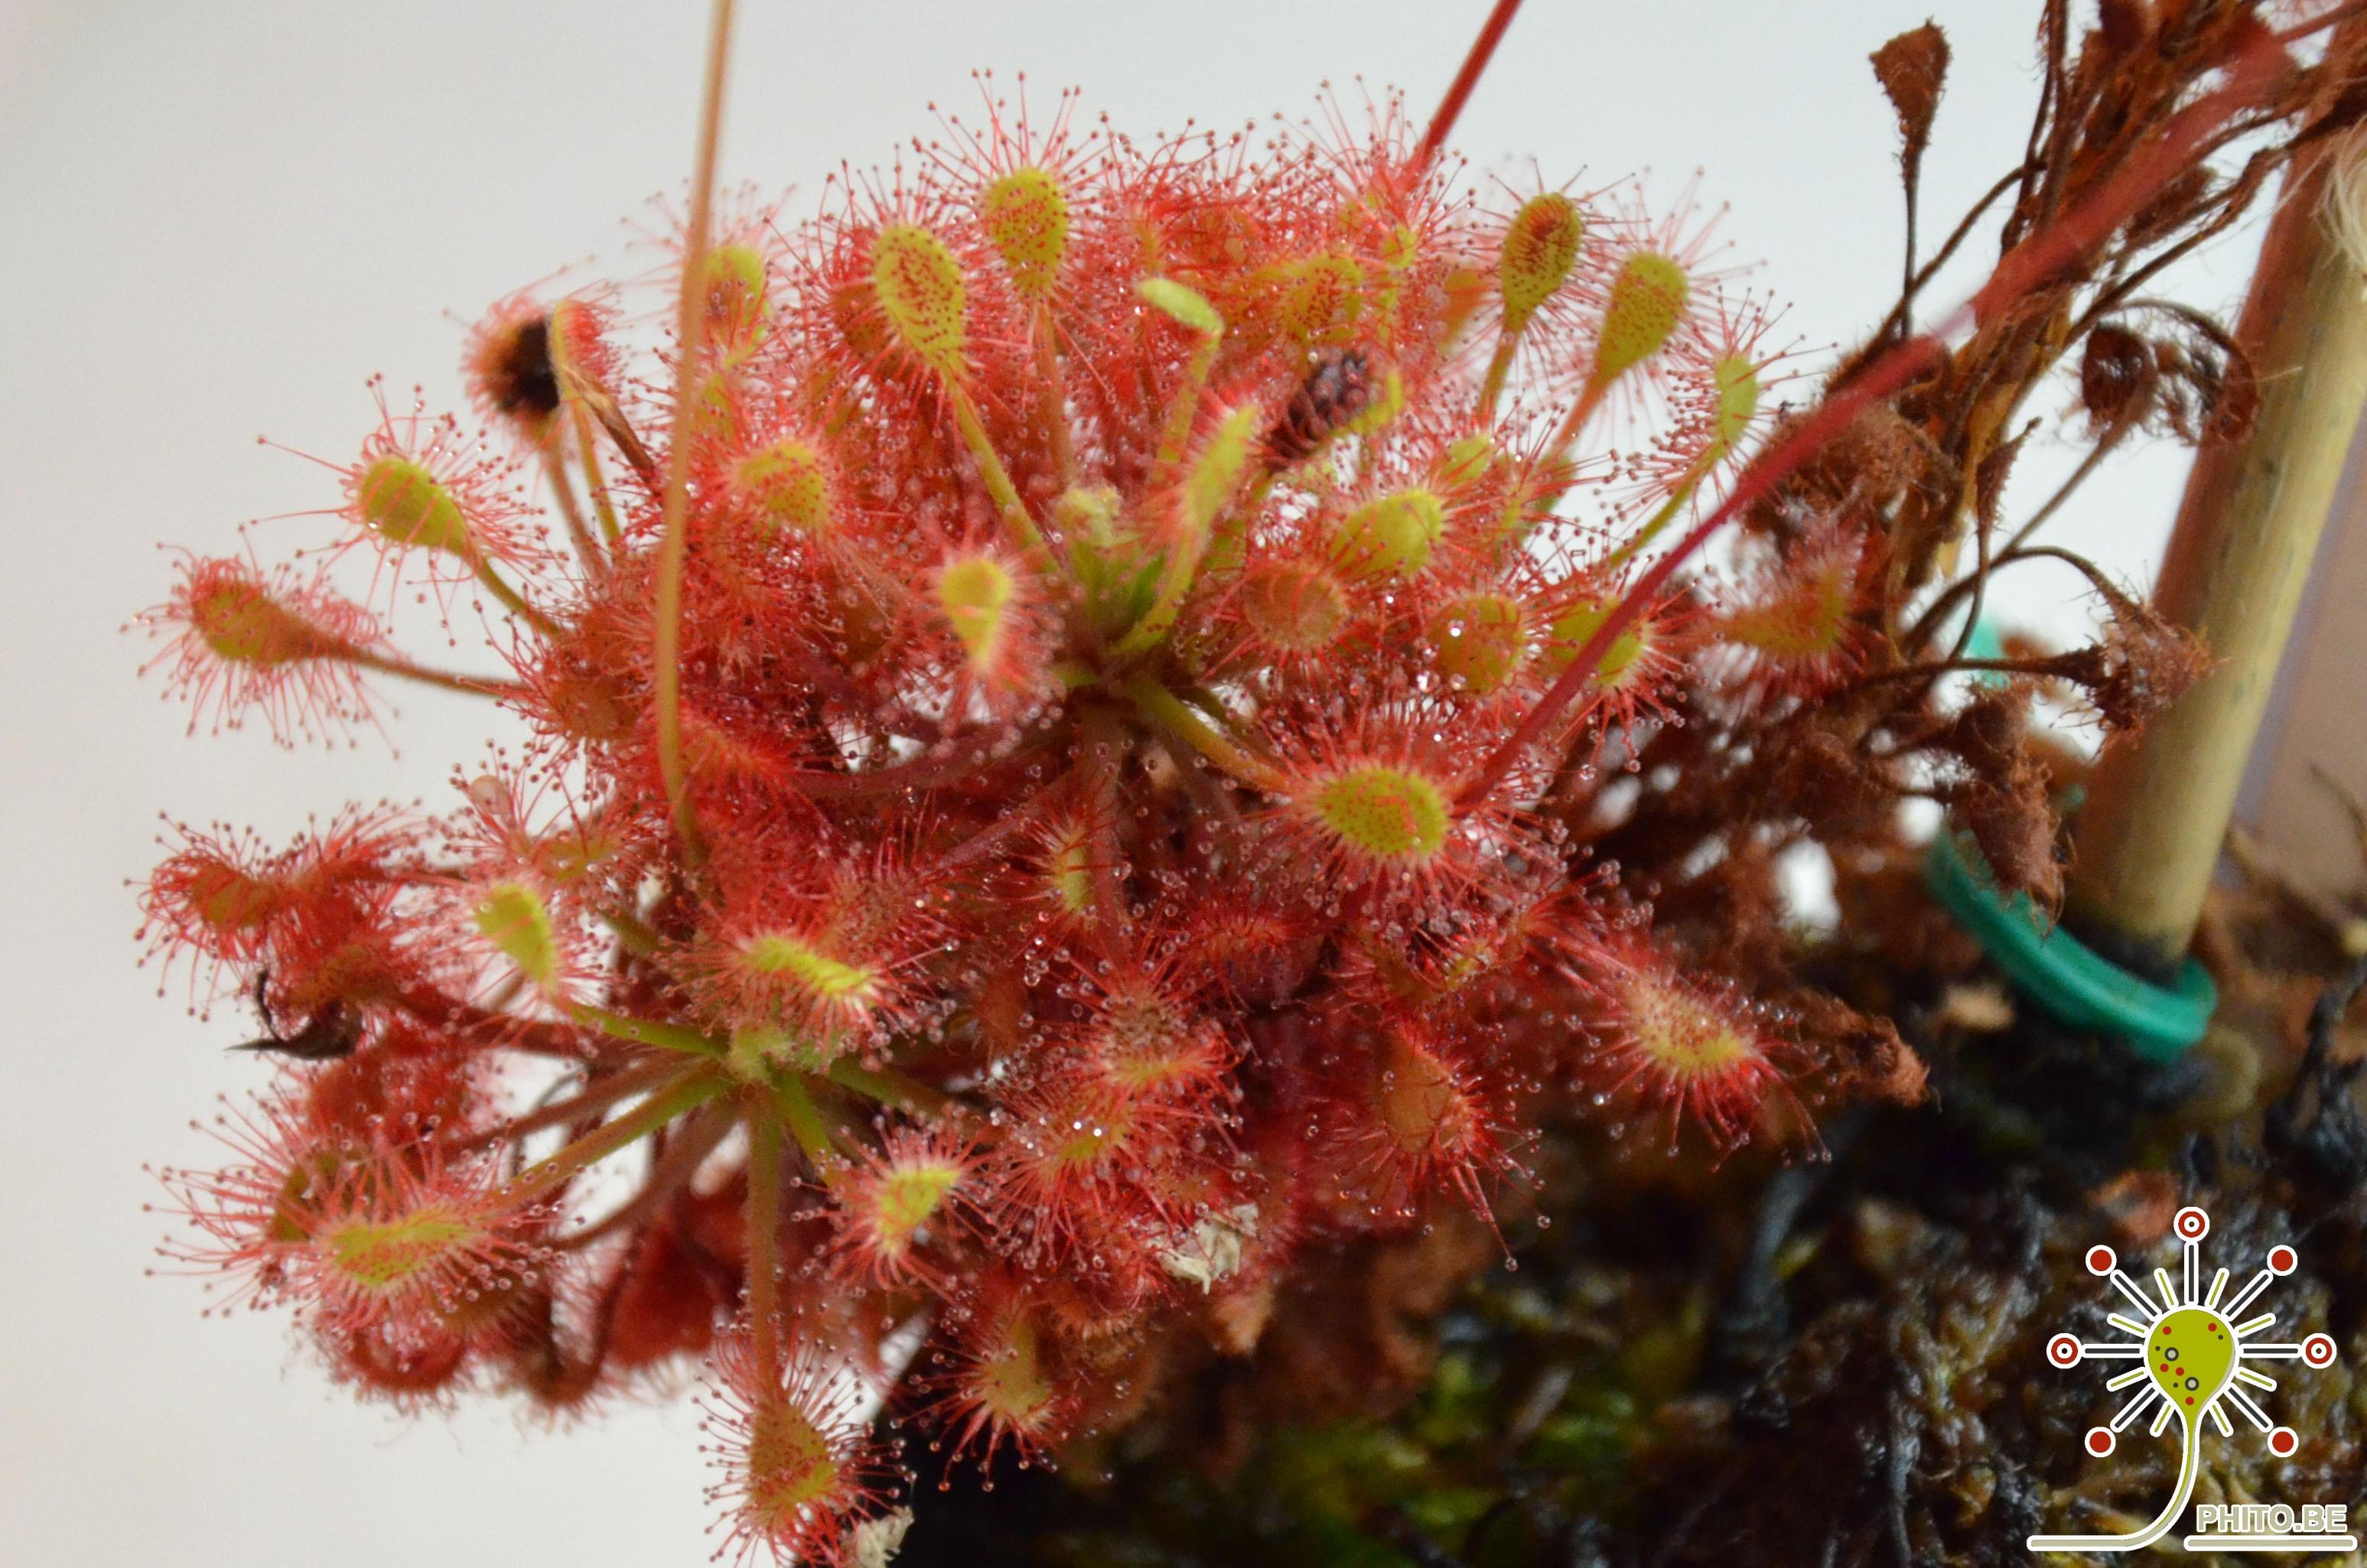 Propagating Drosera madagascariensis